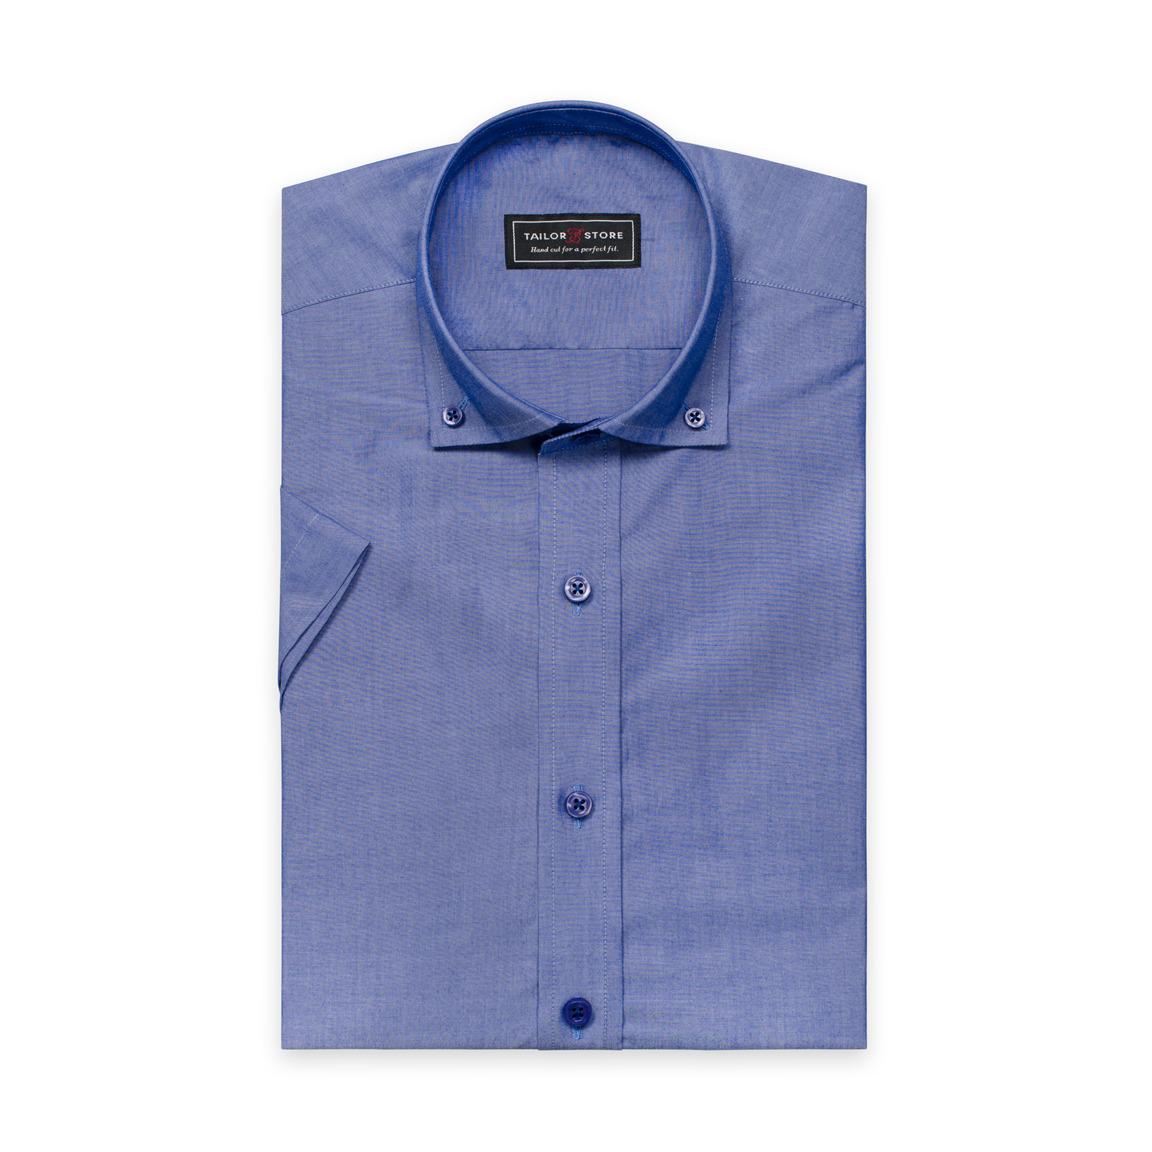 Dark blue button-down modern shirt